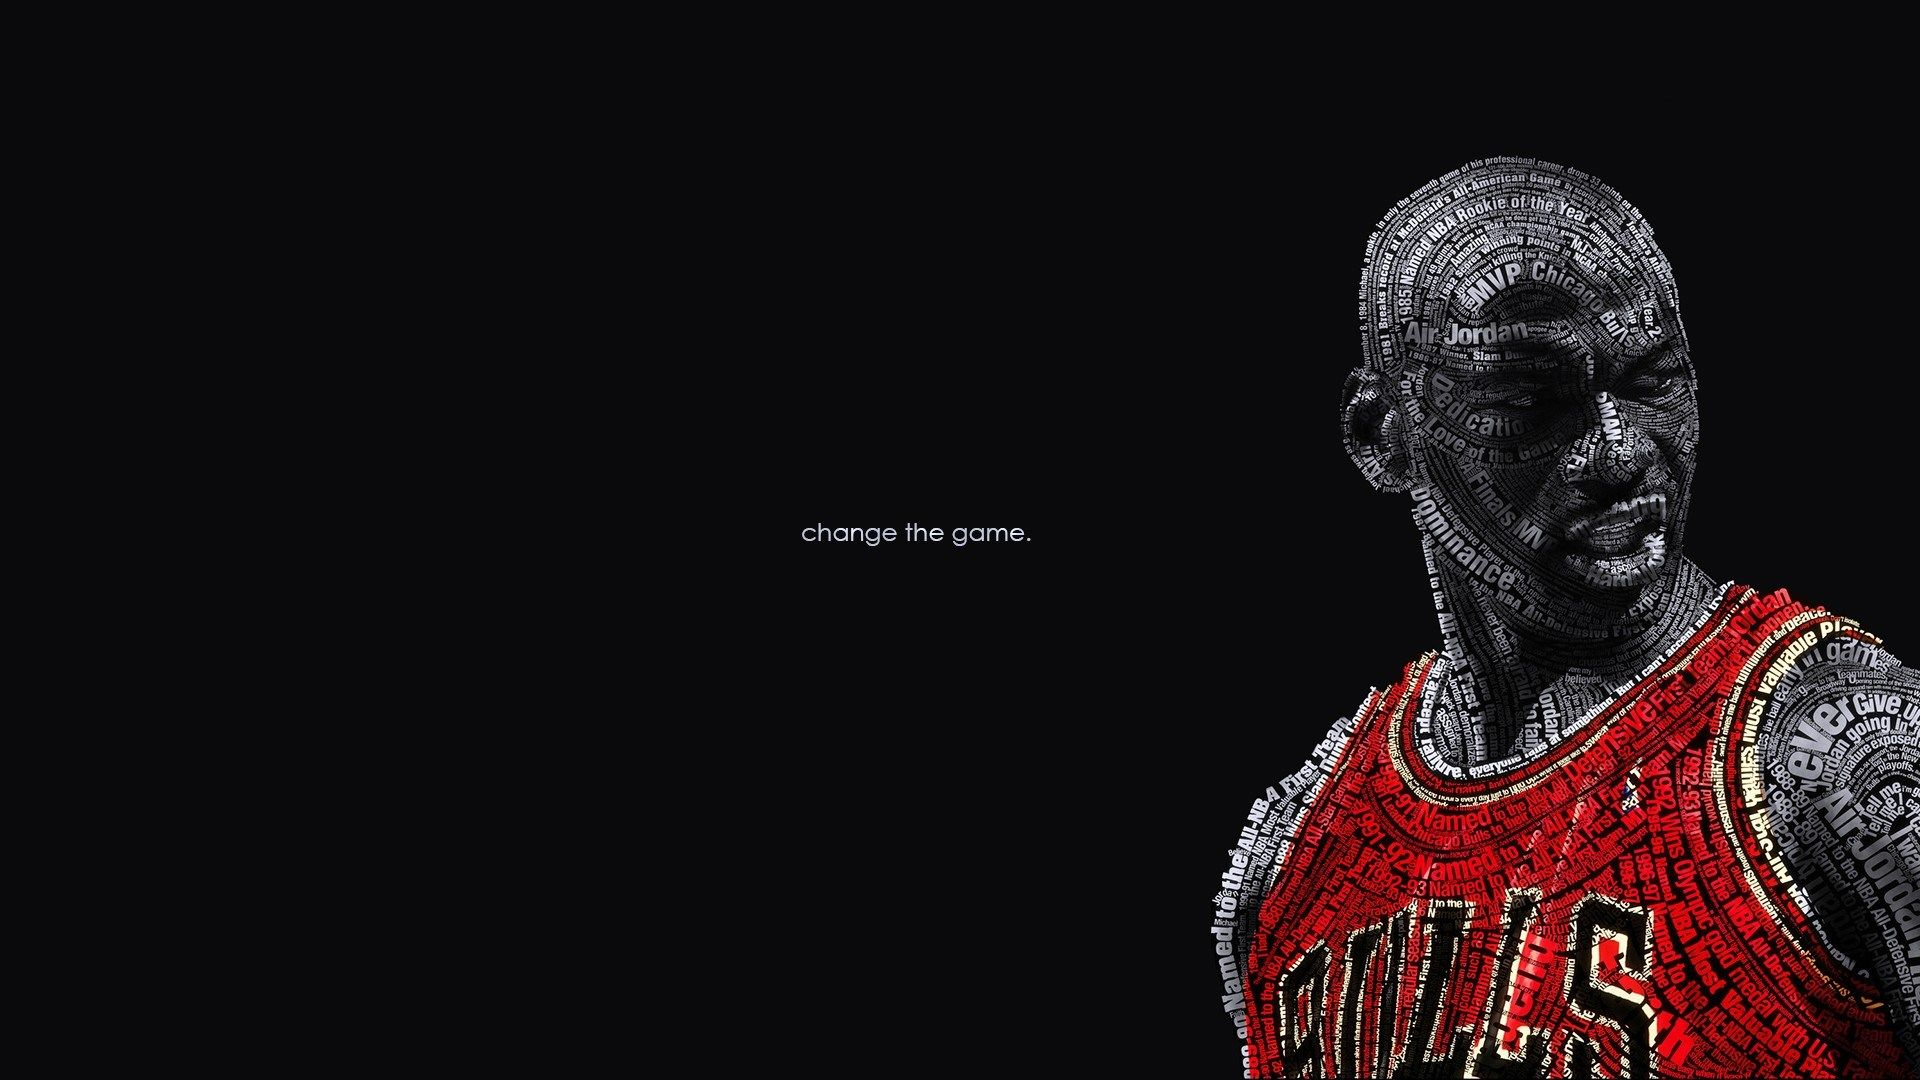 Basketball Desktop Background Pictures Free Jordan Logo Wallpaper Hypebeast Wallpaper Bulls Wallpaper